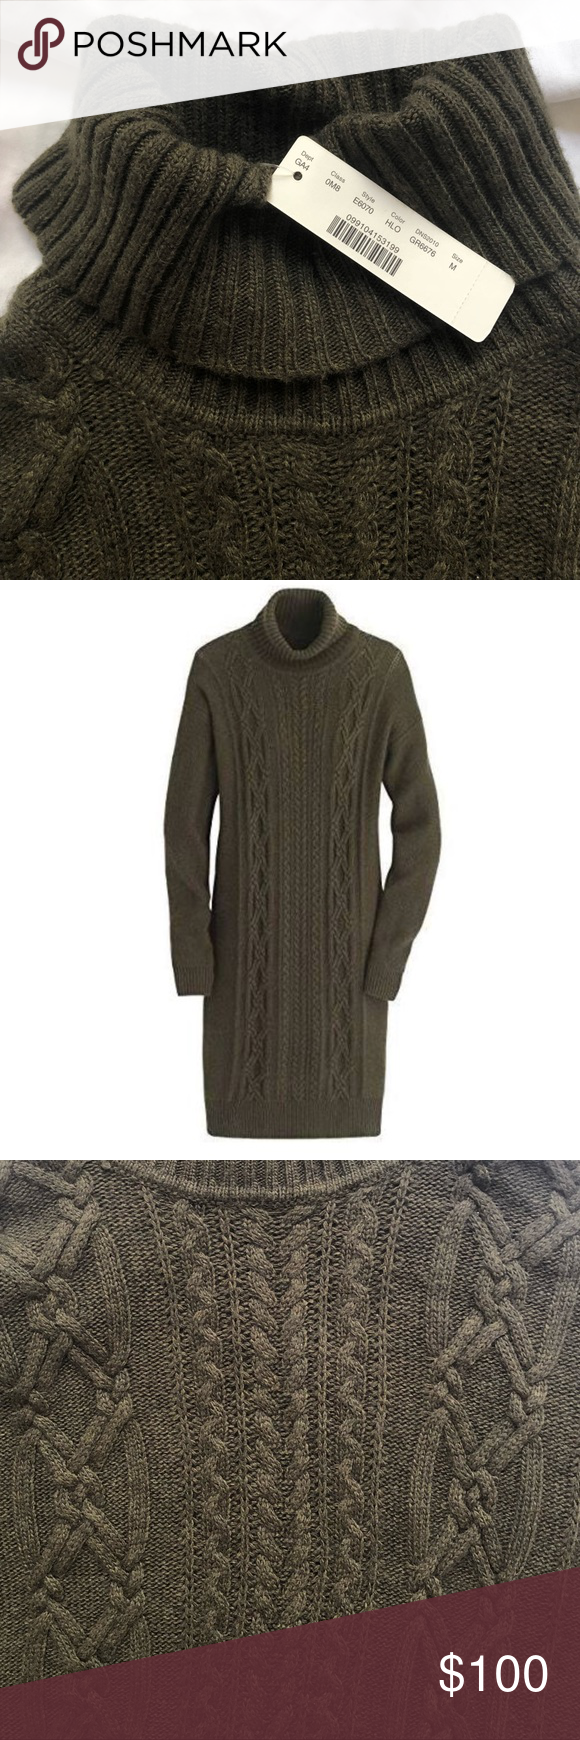 0b127cbce19 J.CREW Cable turtleneck sweater-dress Warm Sweater Dress Never Worn  Wool nylon viscose. cozy wool-blend cable-knit. J. Crew Dresses